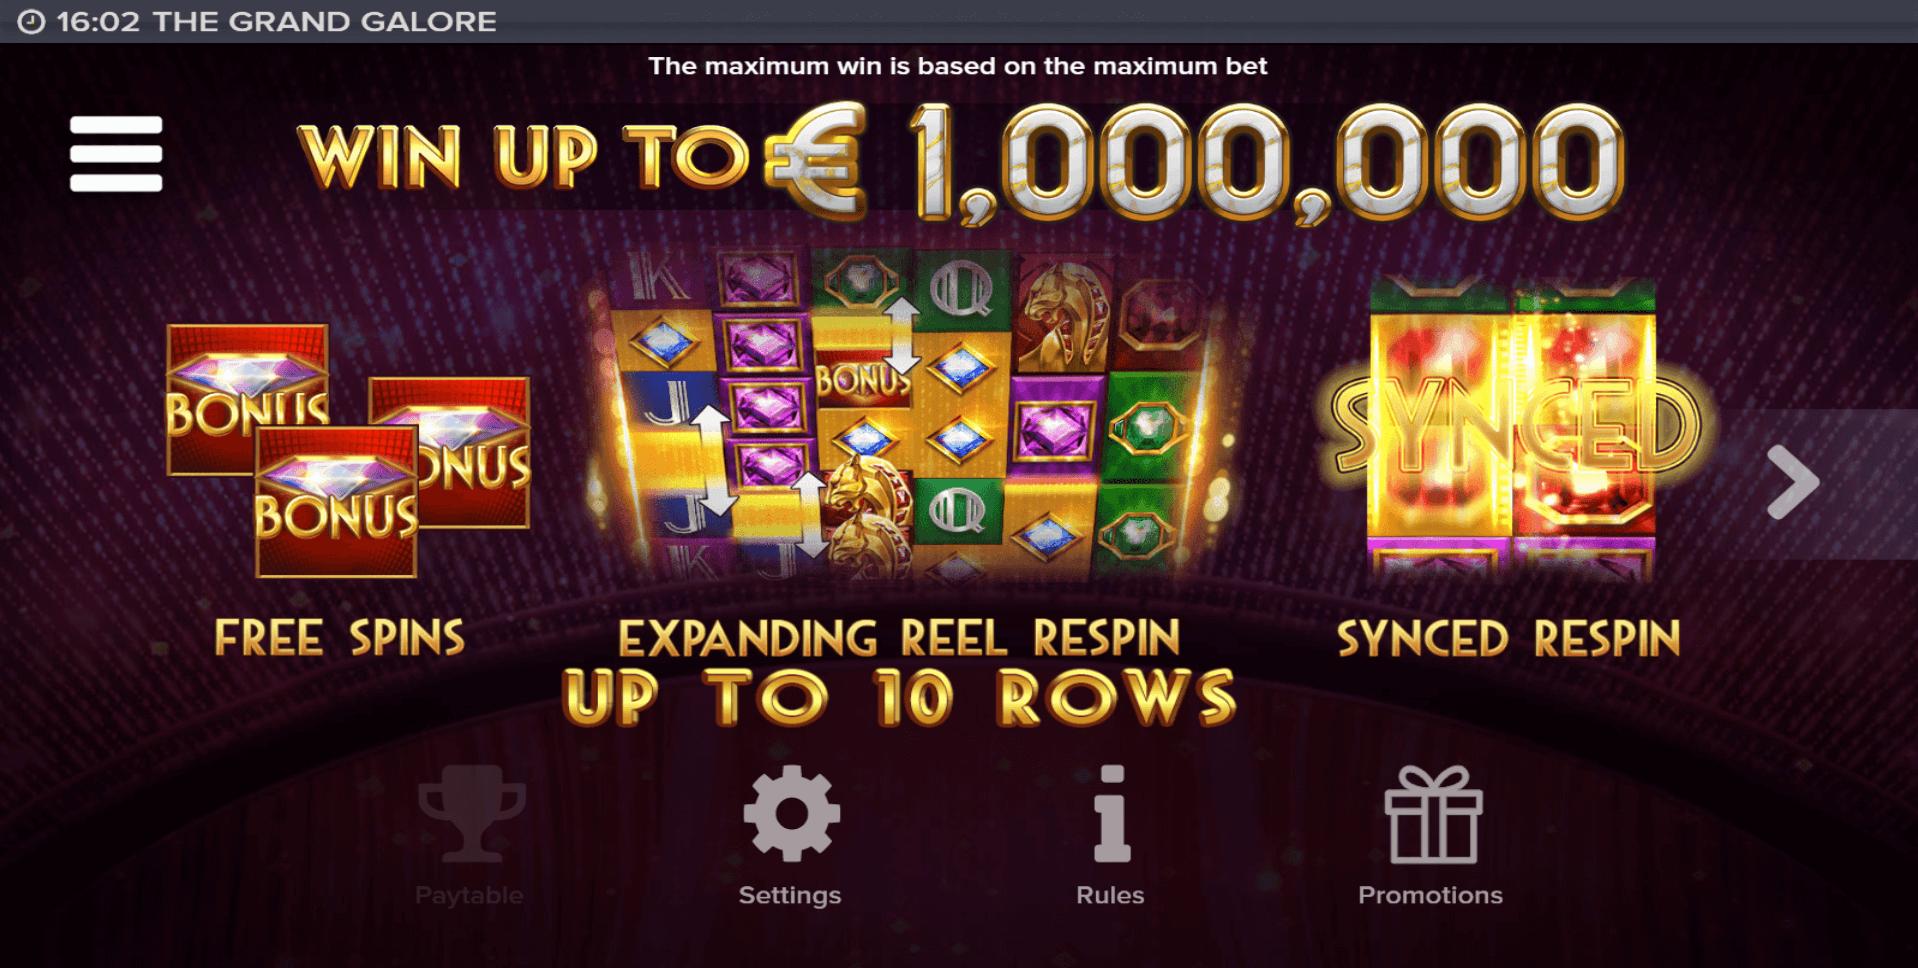 Grand Galore Slot Machine